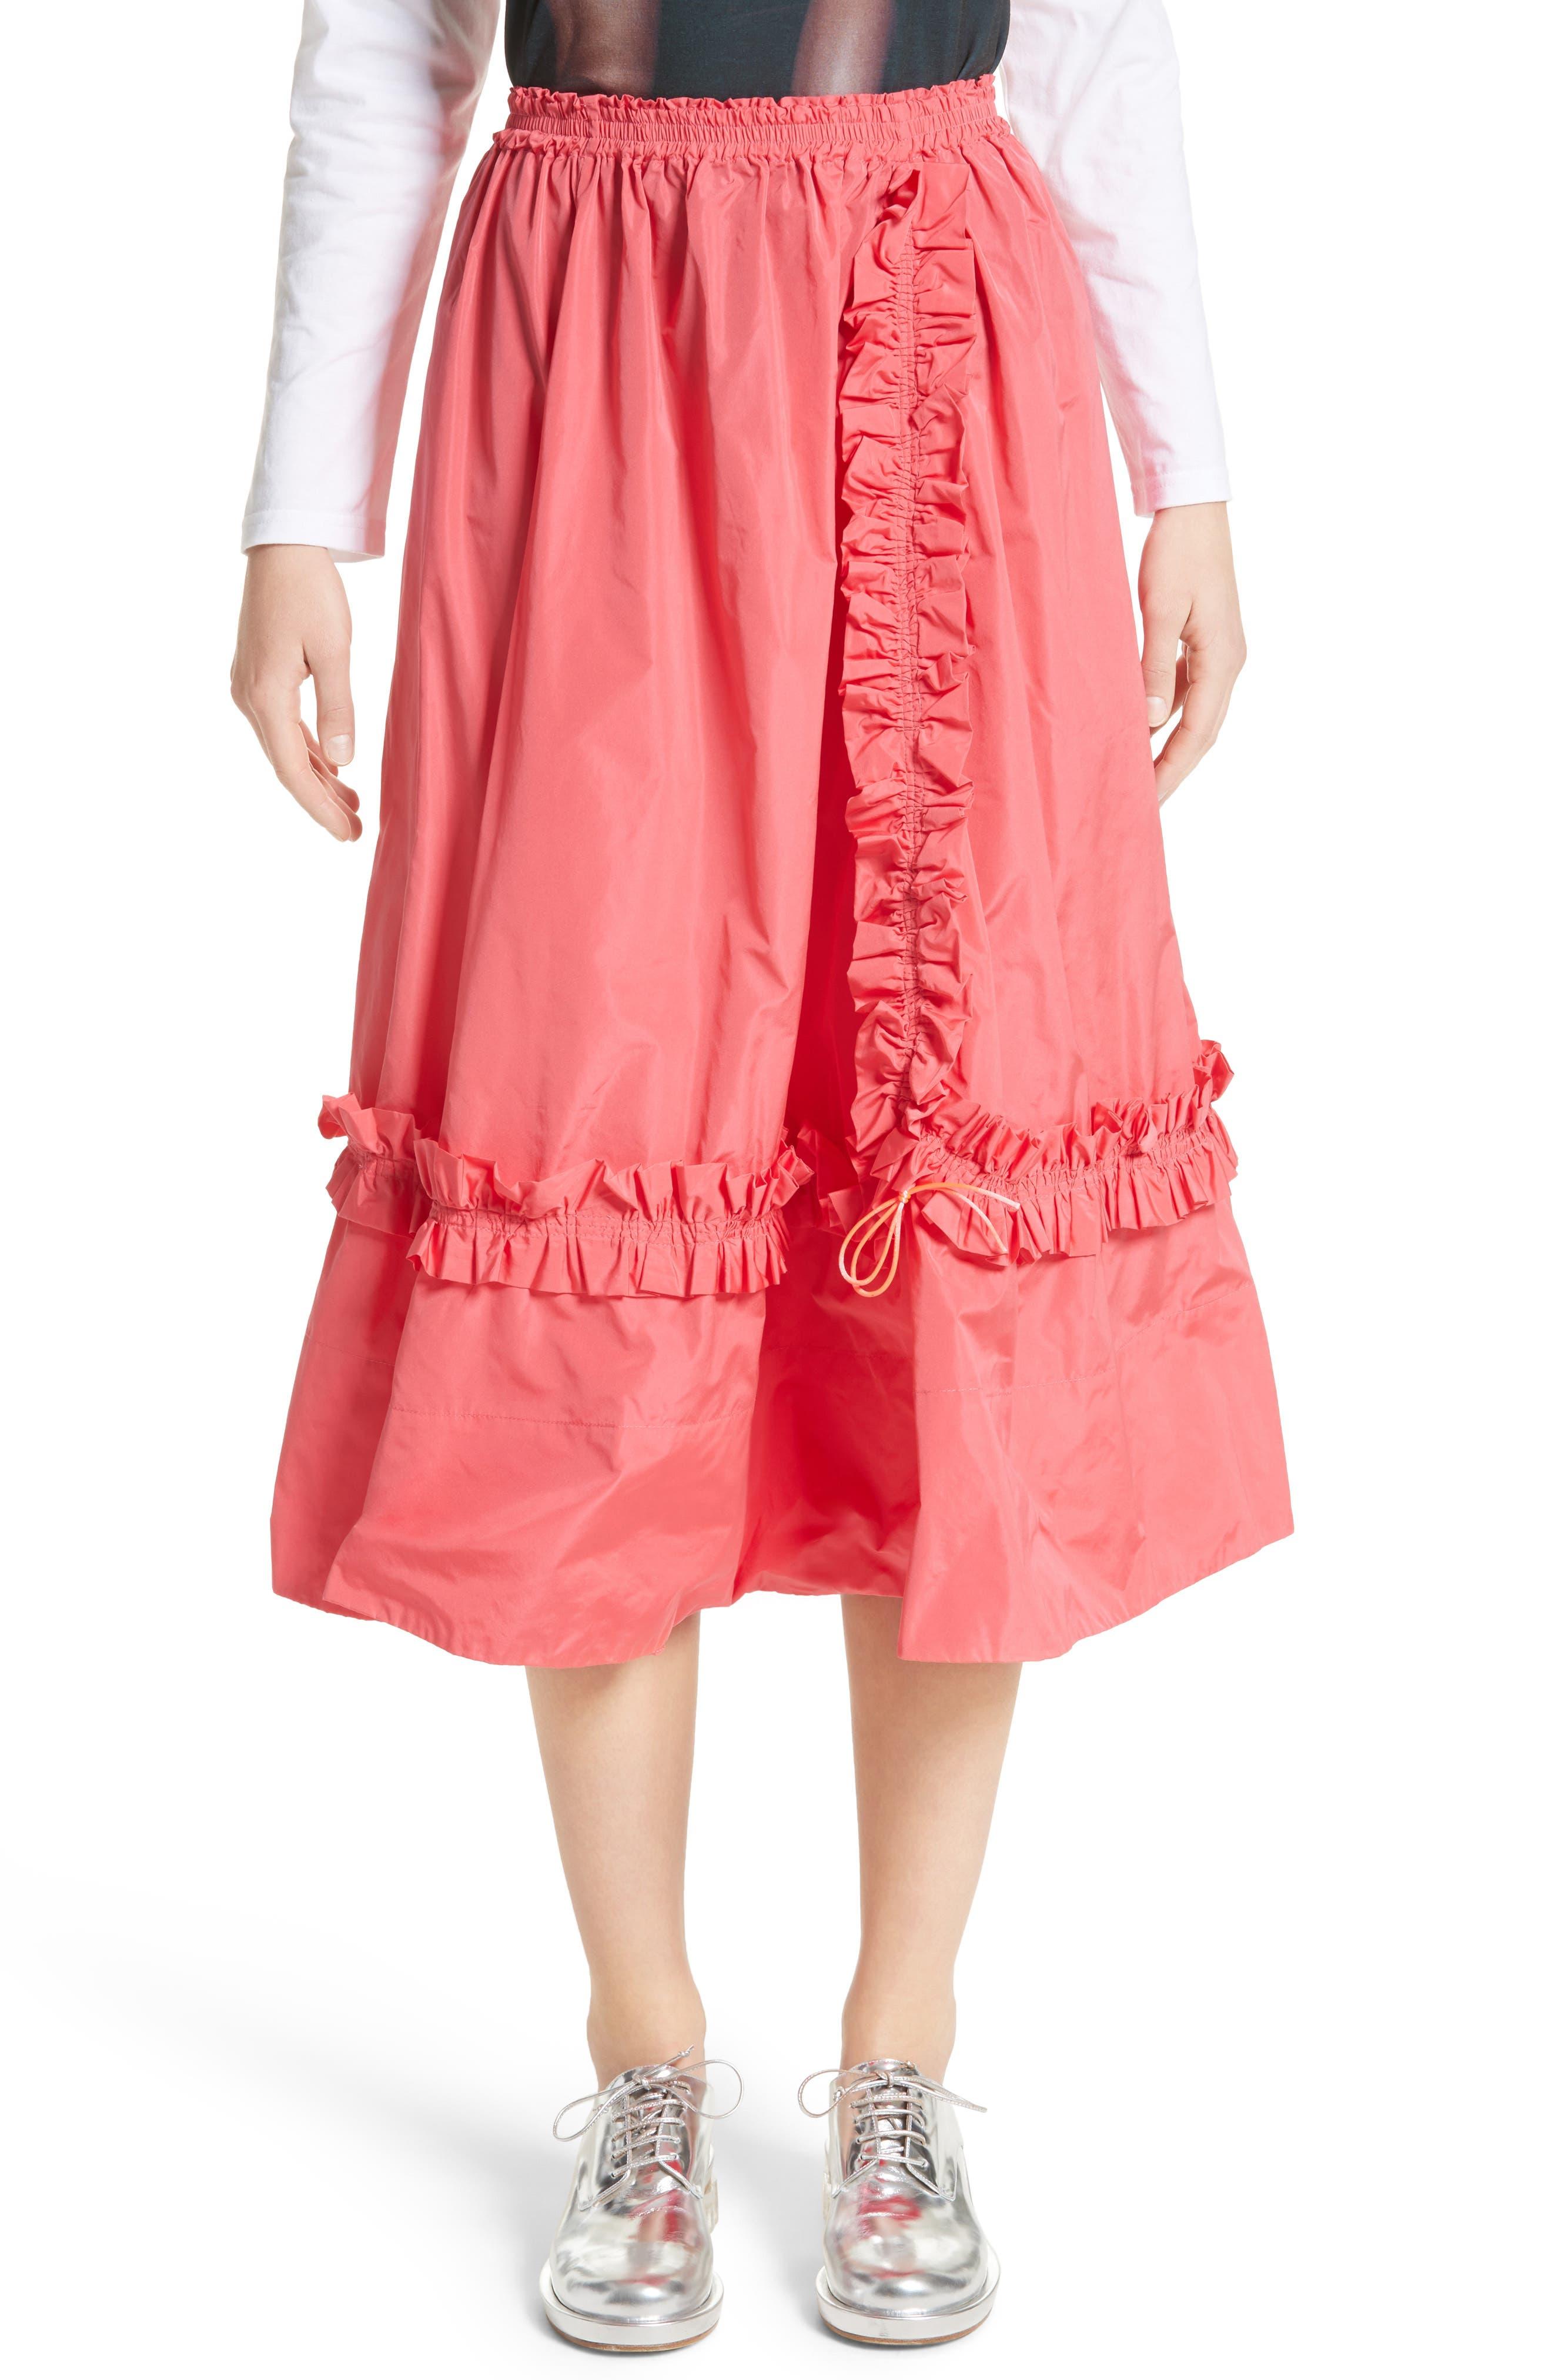 MOLLY GODDARD Skirt